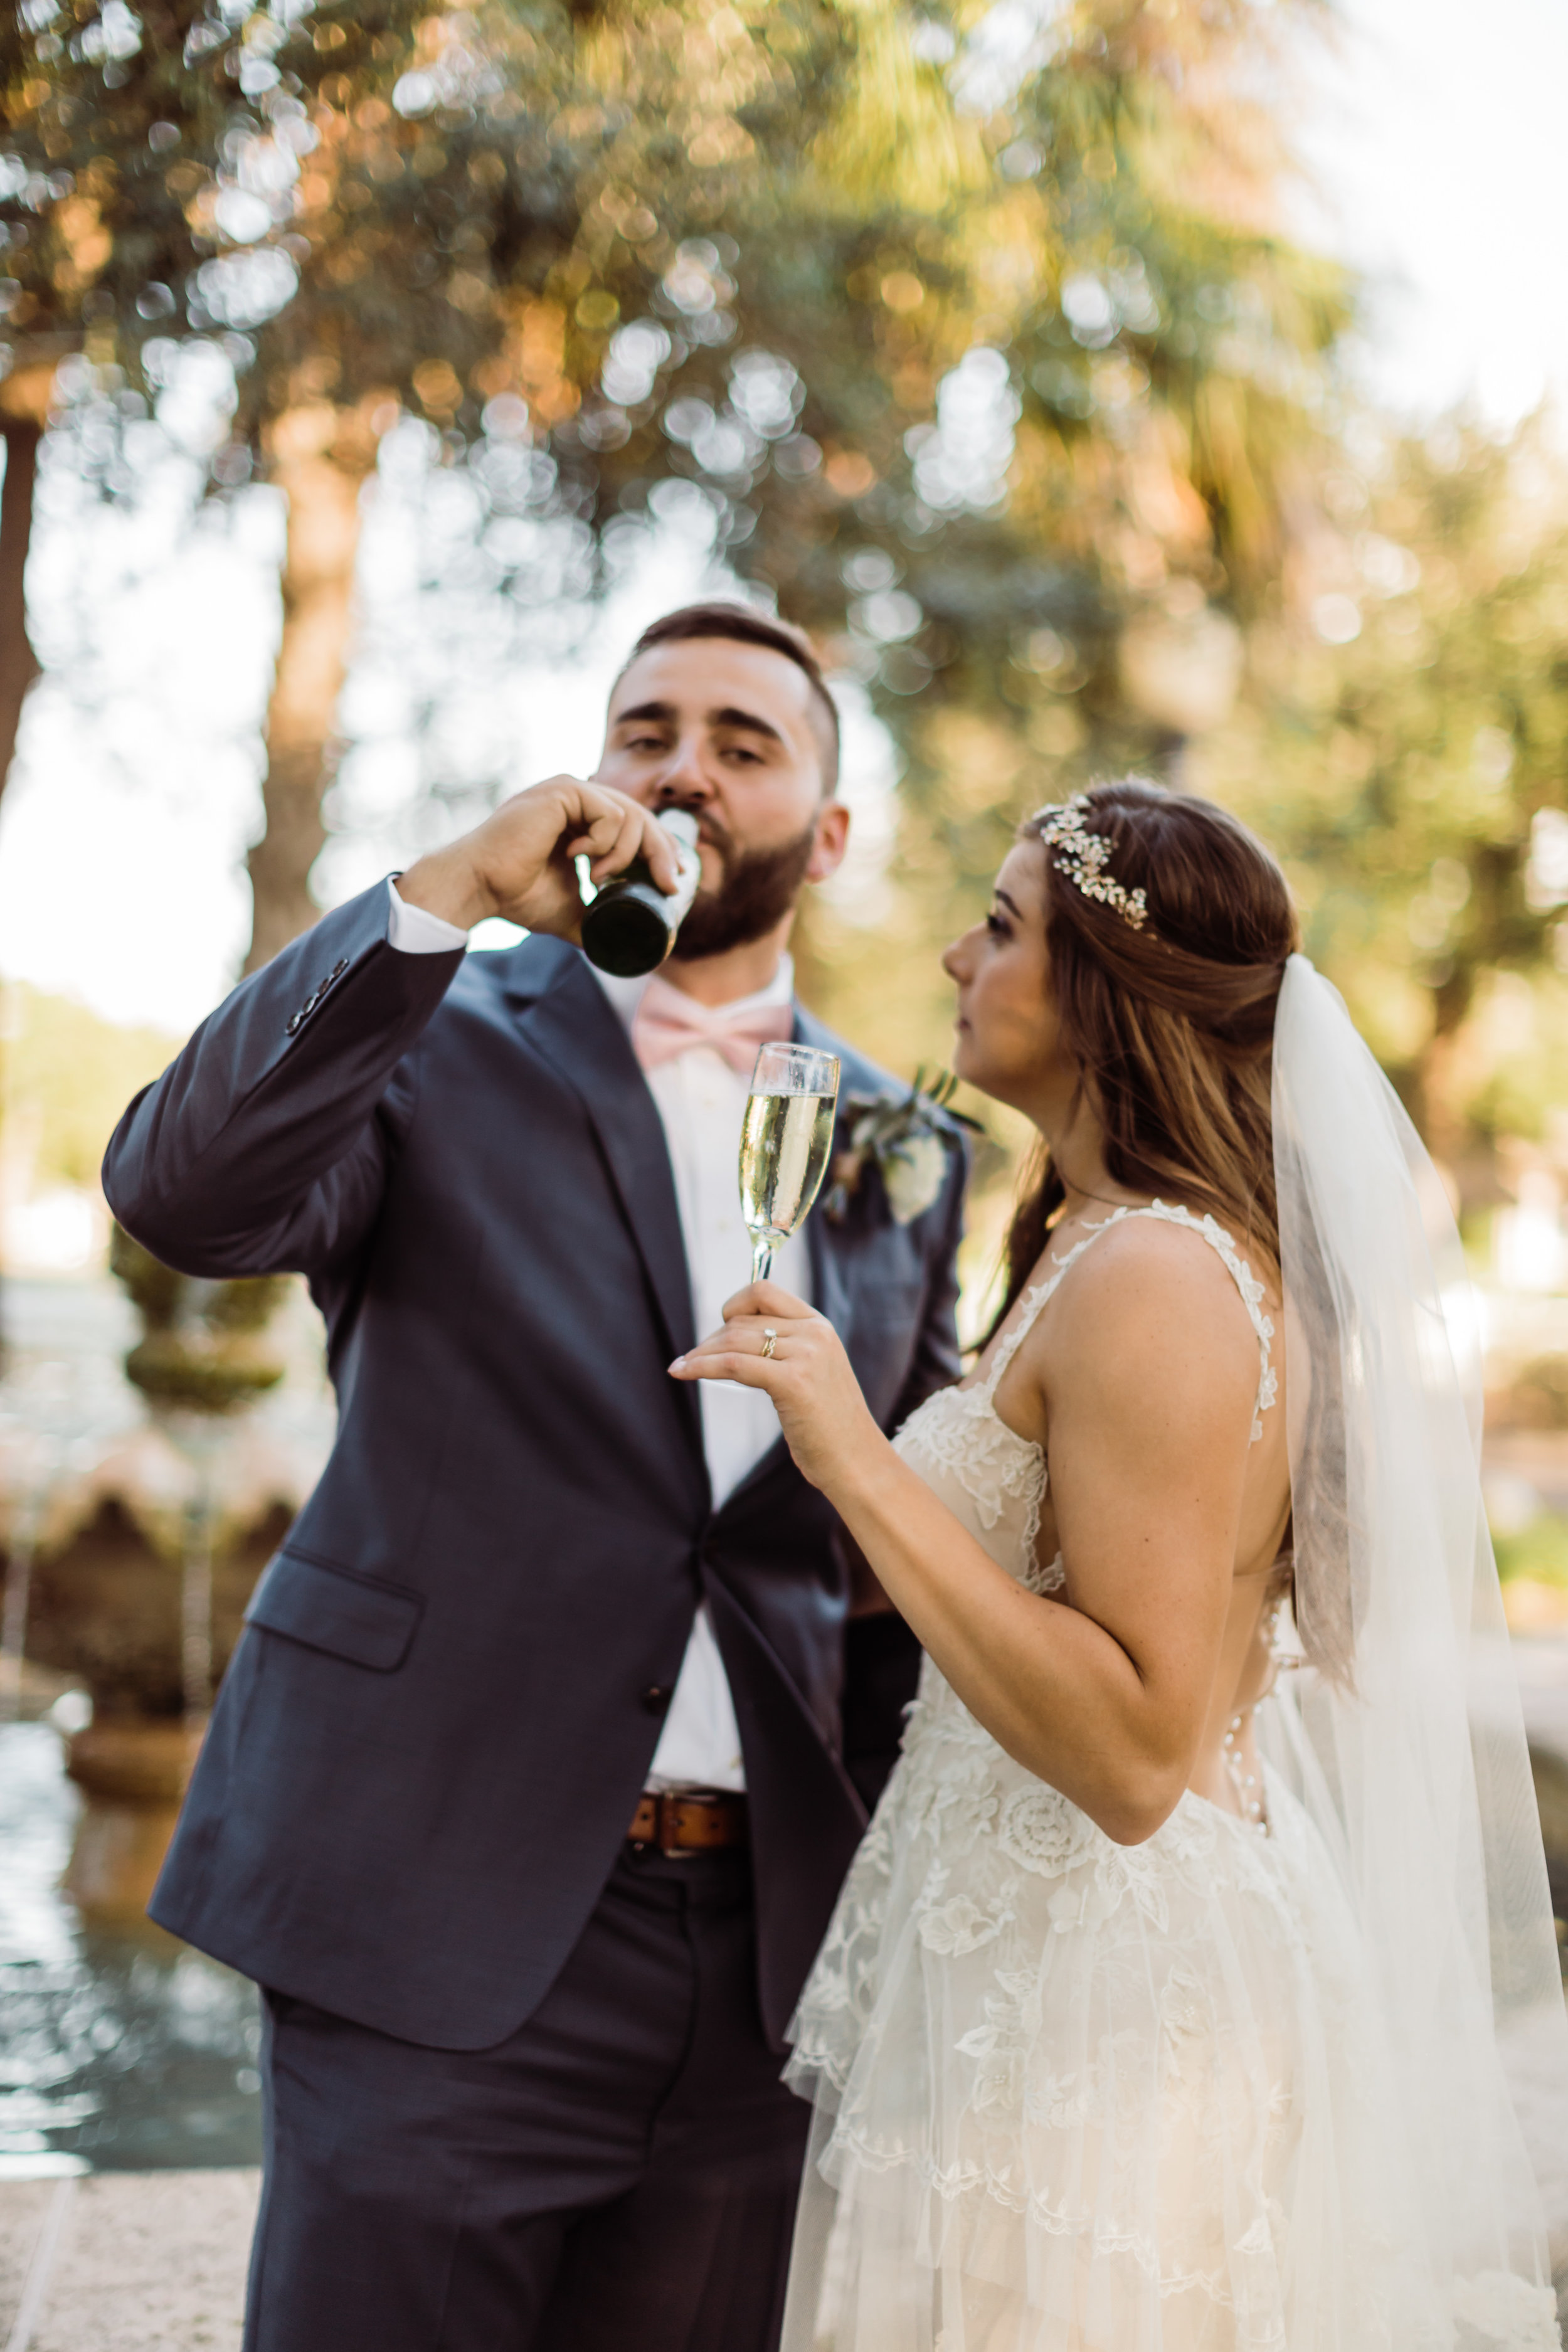 2017.10.15 Steffi and Elliott Simmonds Casa Feliz Wedding (616 of 969).jpg